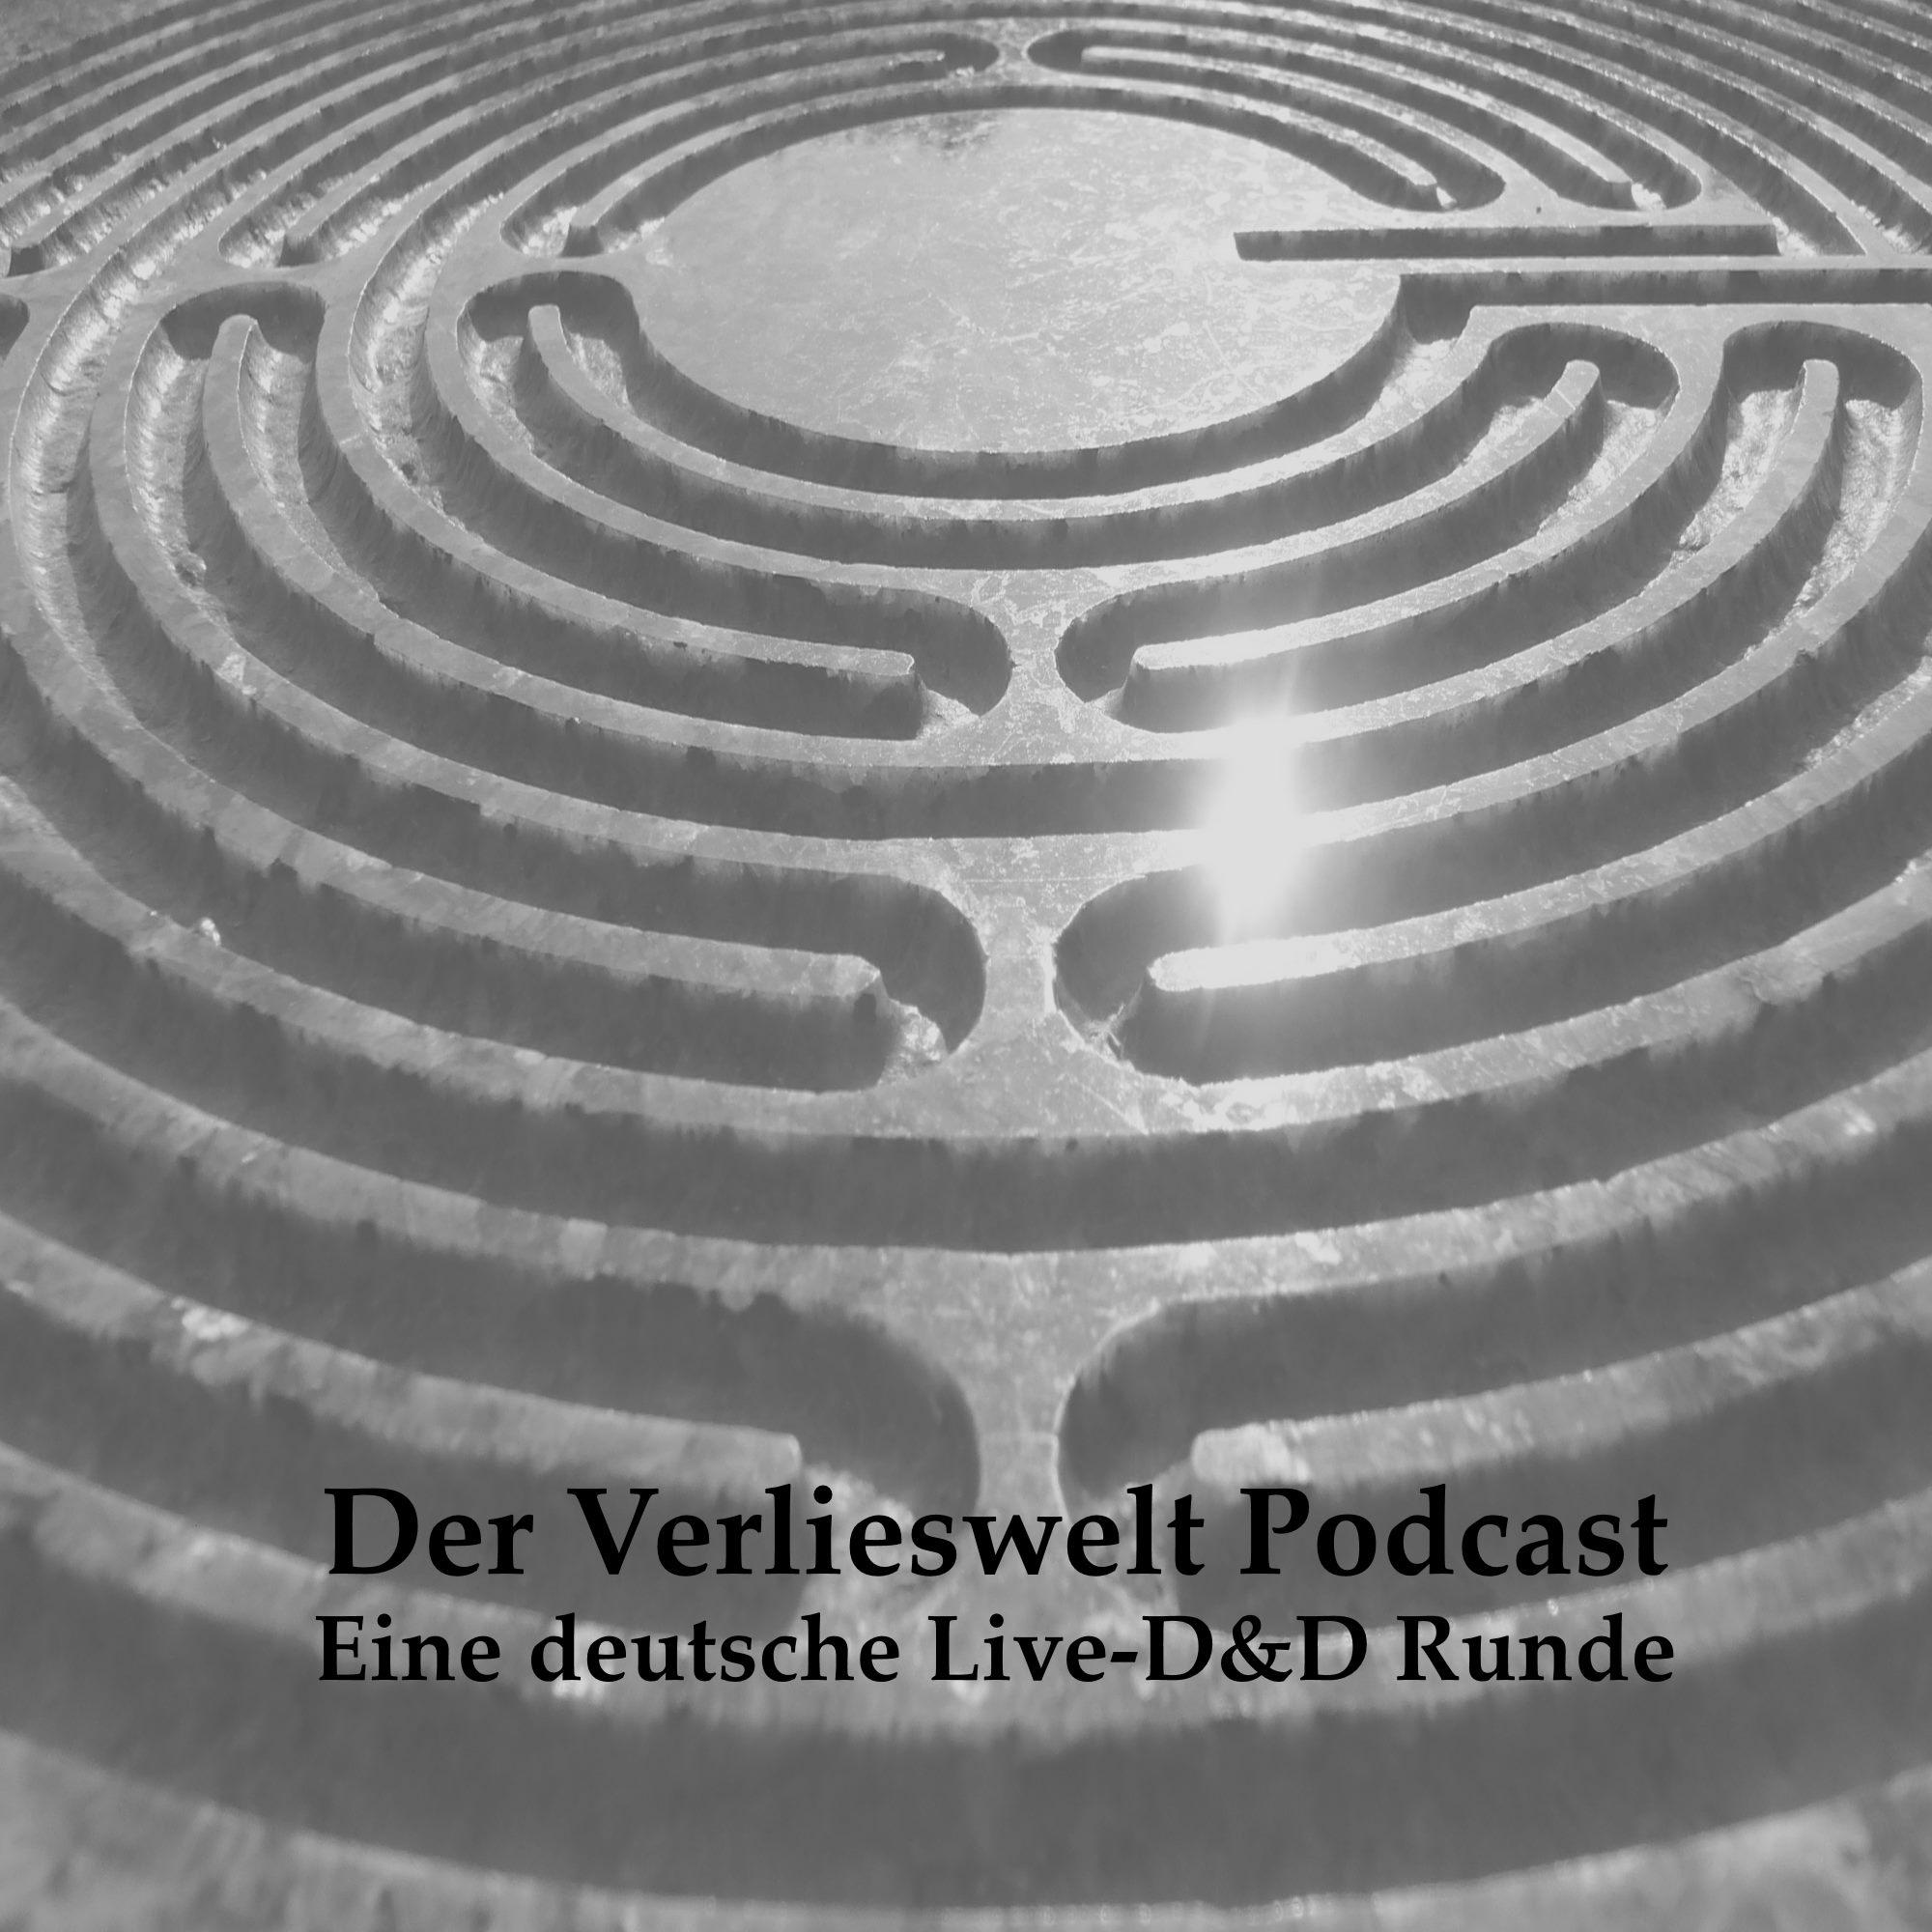 Der Verlieswelt Podcast